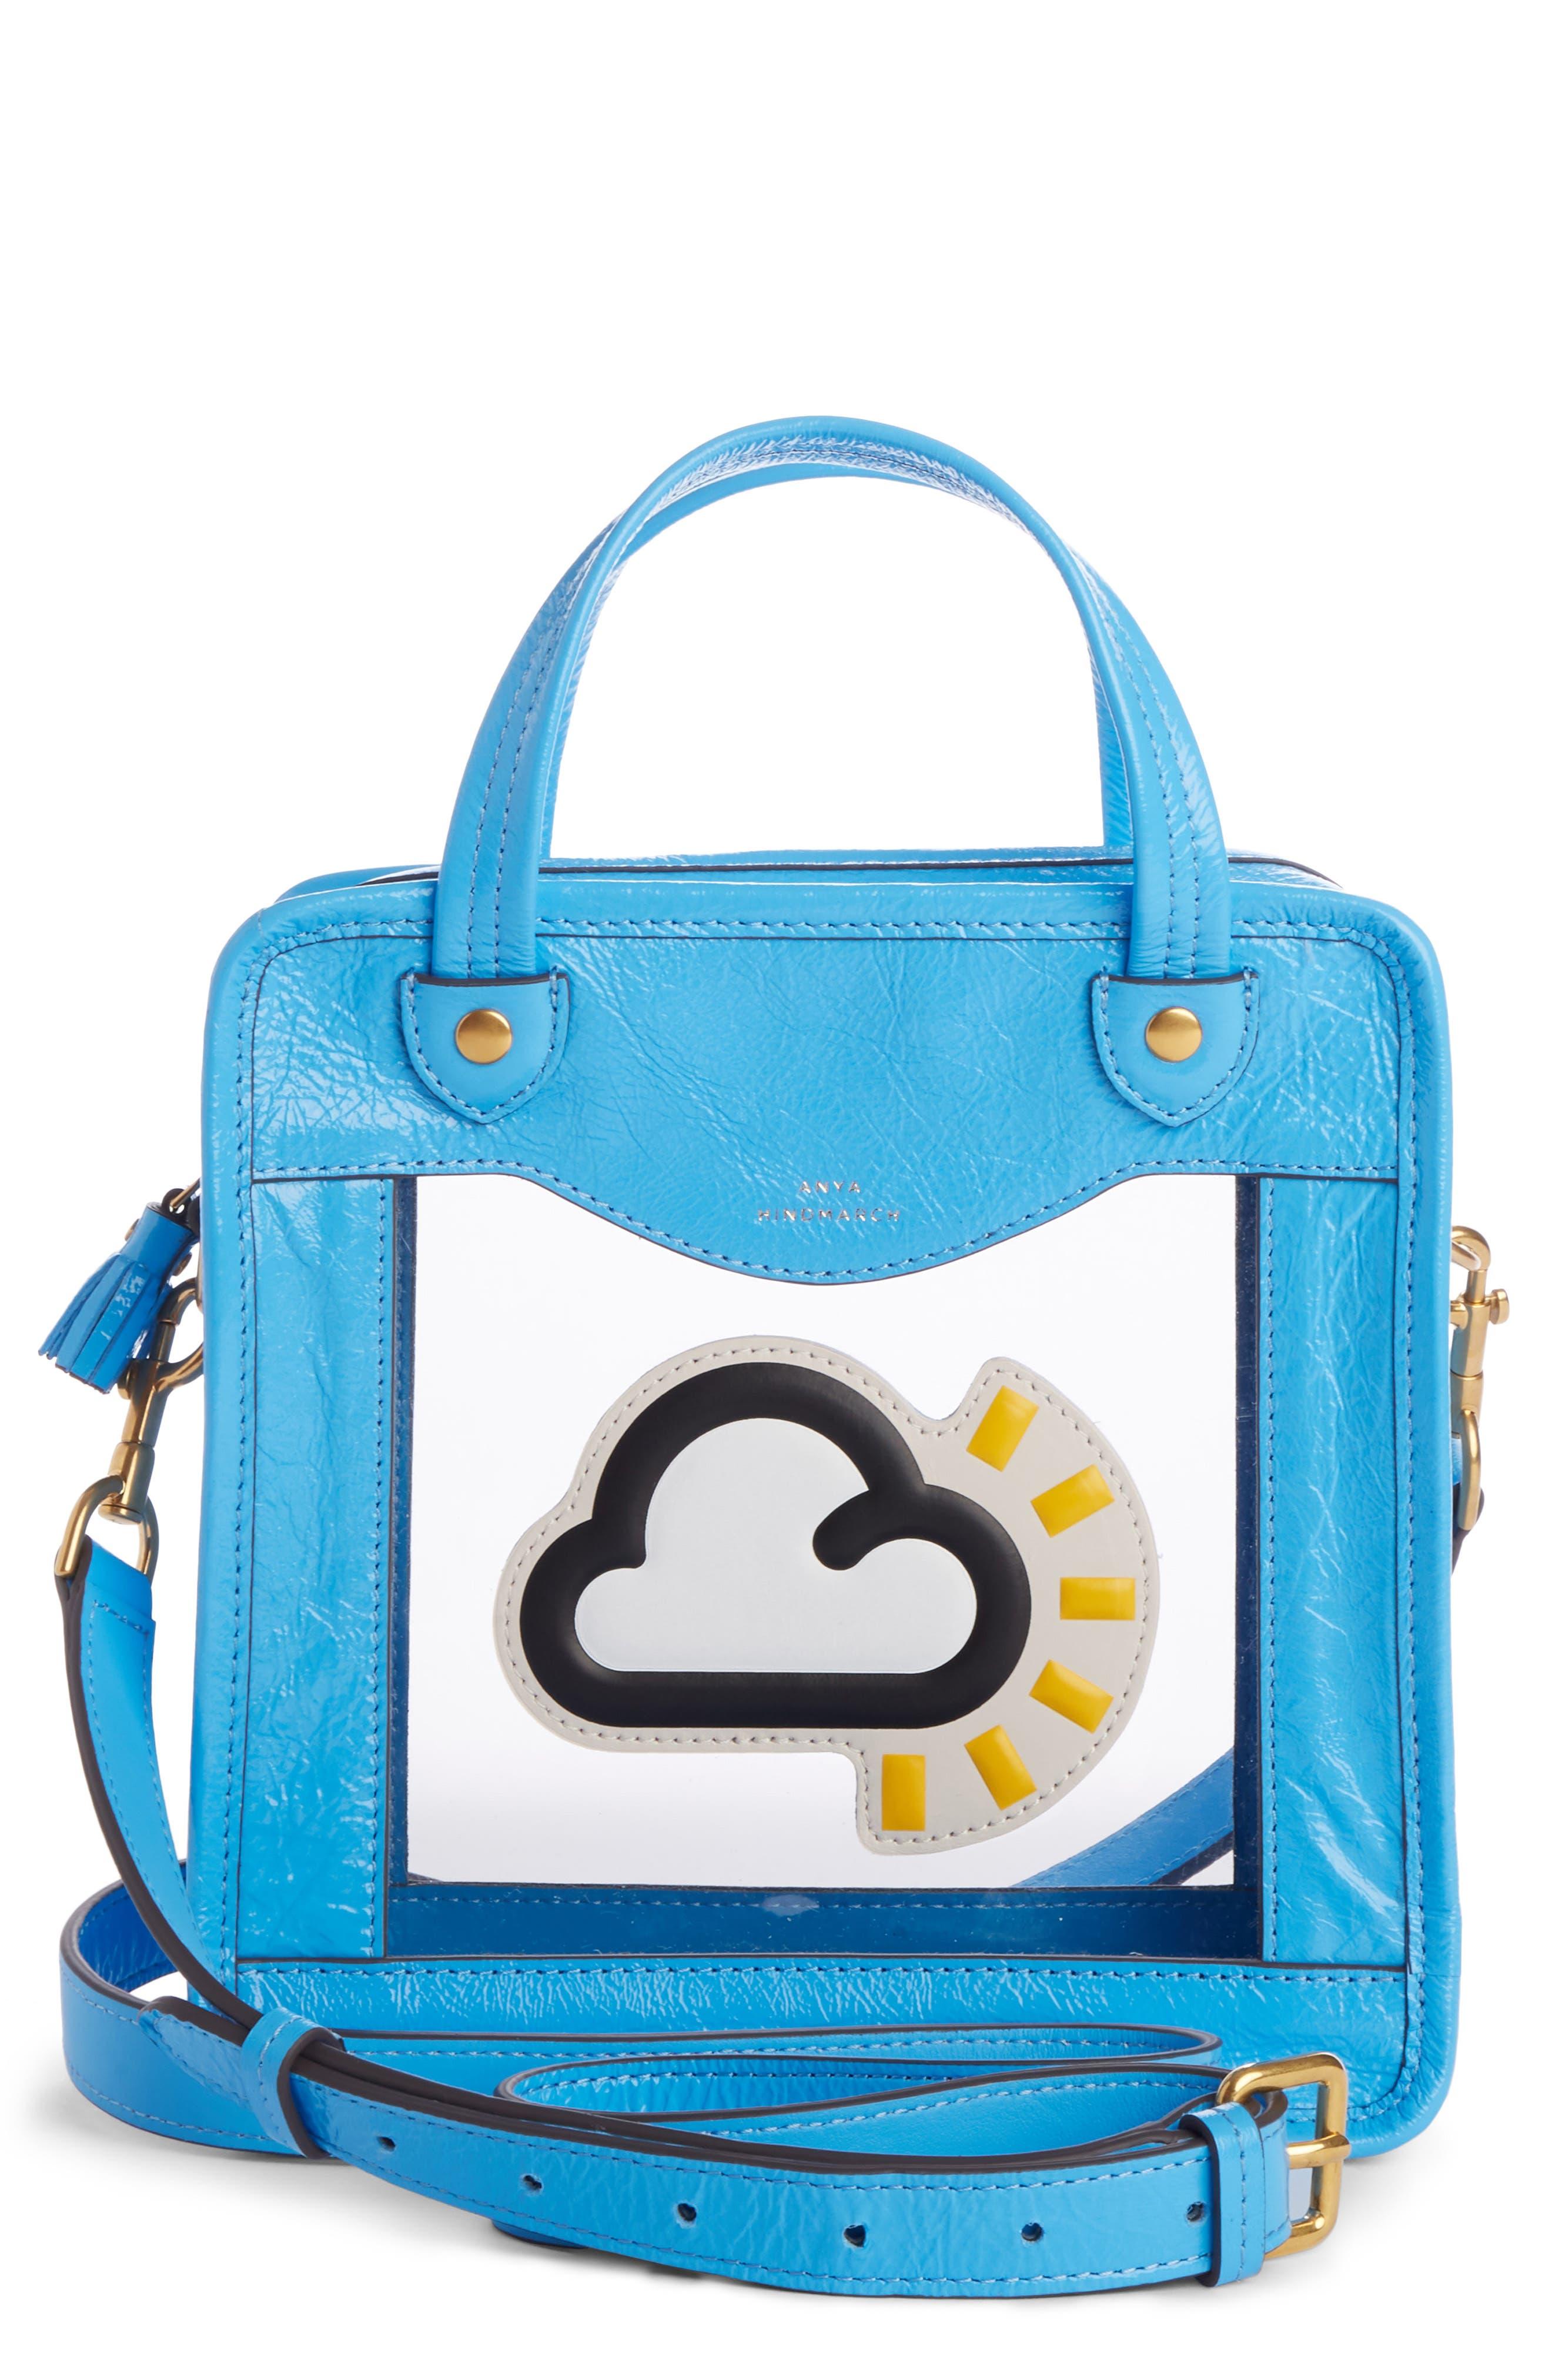 Rainy Day Crossbody Bag,                             Main thumbnail 1, color,                             Blue Quilt